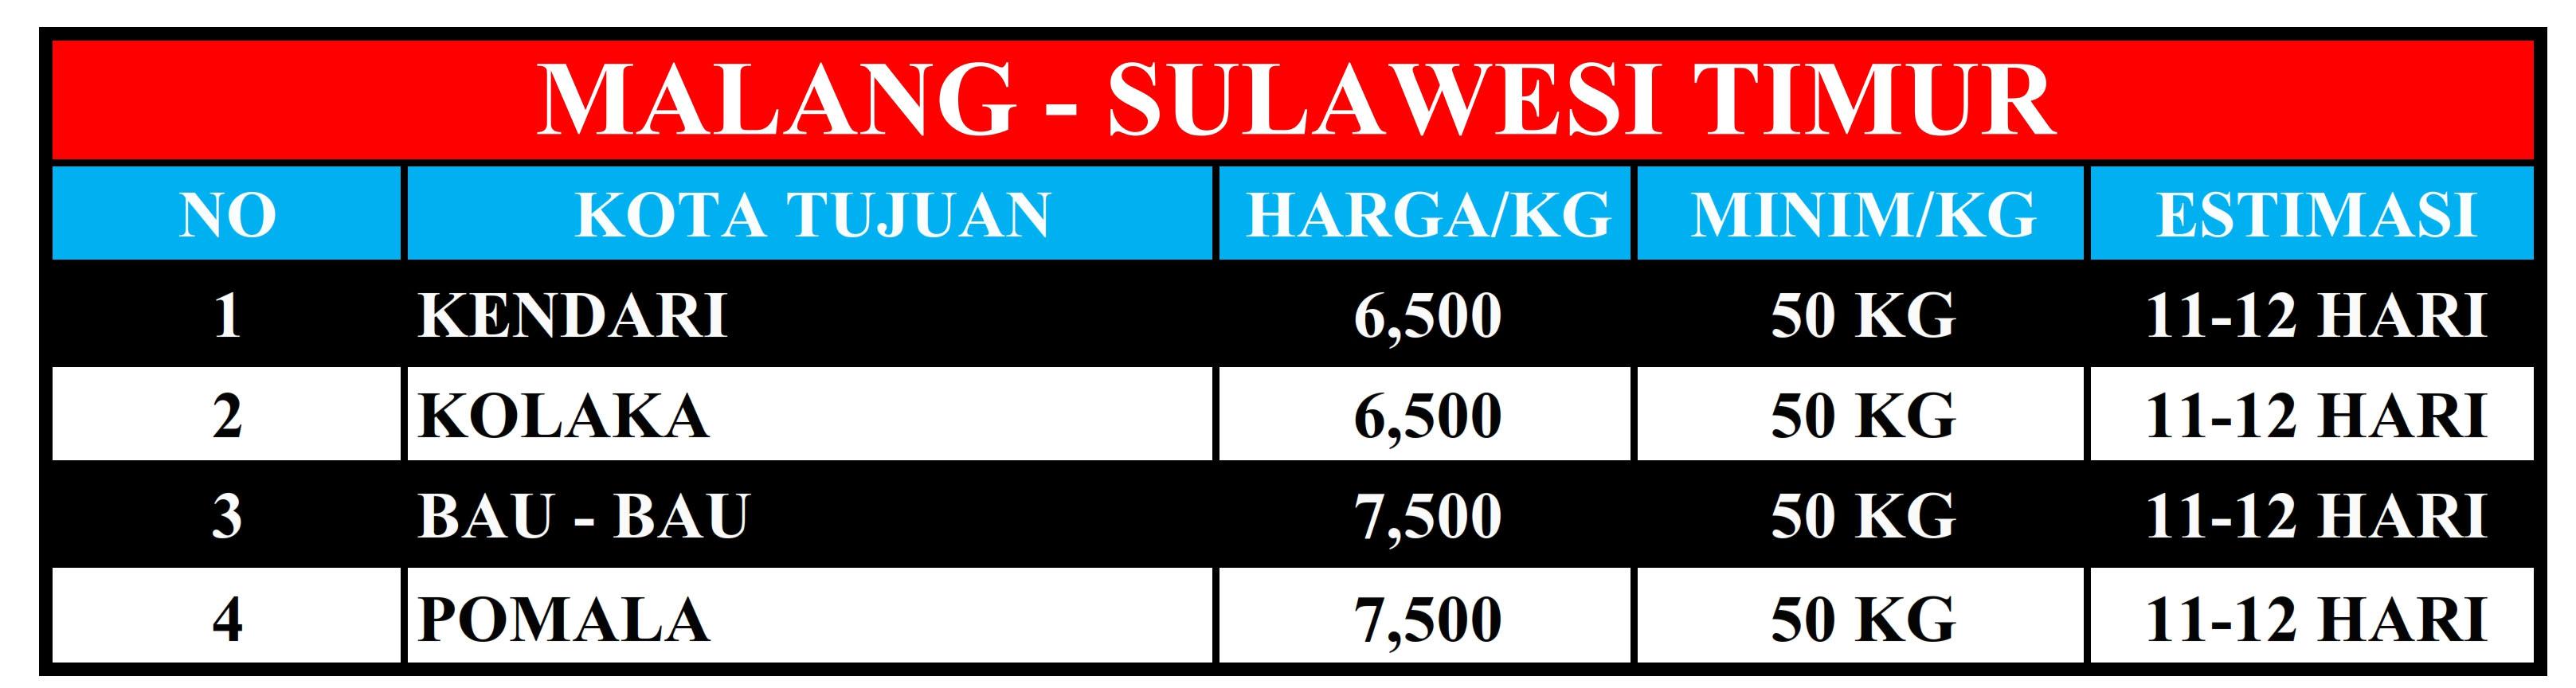 malang-sulawesi timur